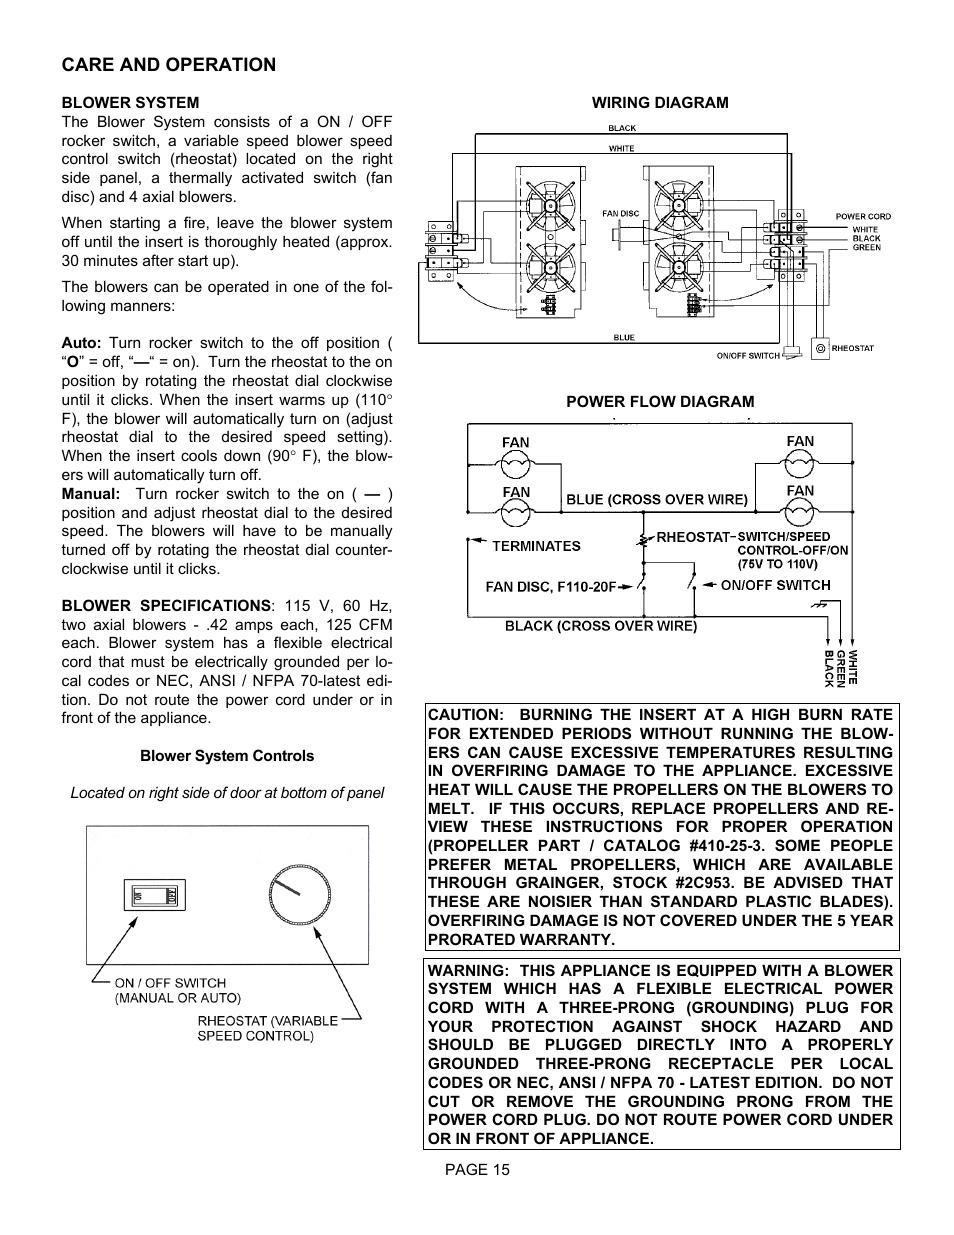 medium resolution of 110 wiring diagram fan switch reostat